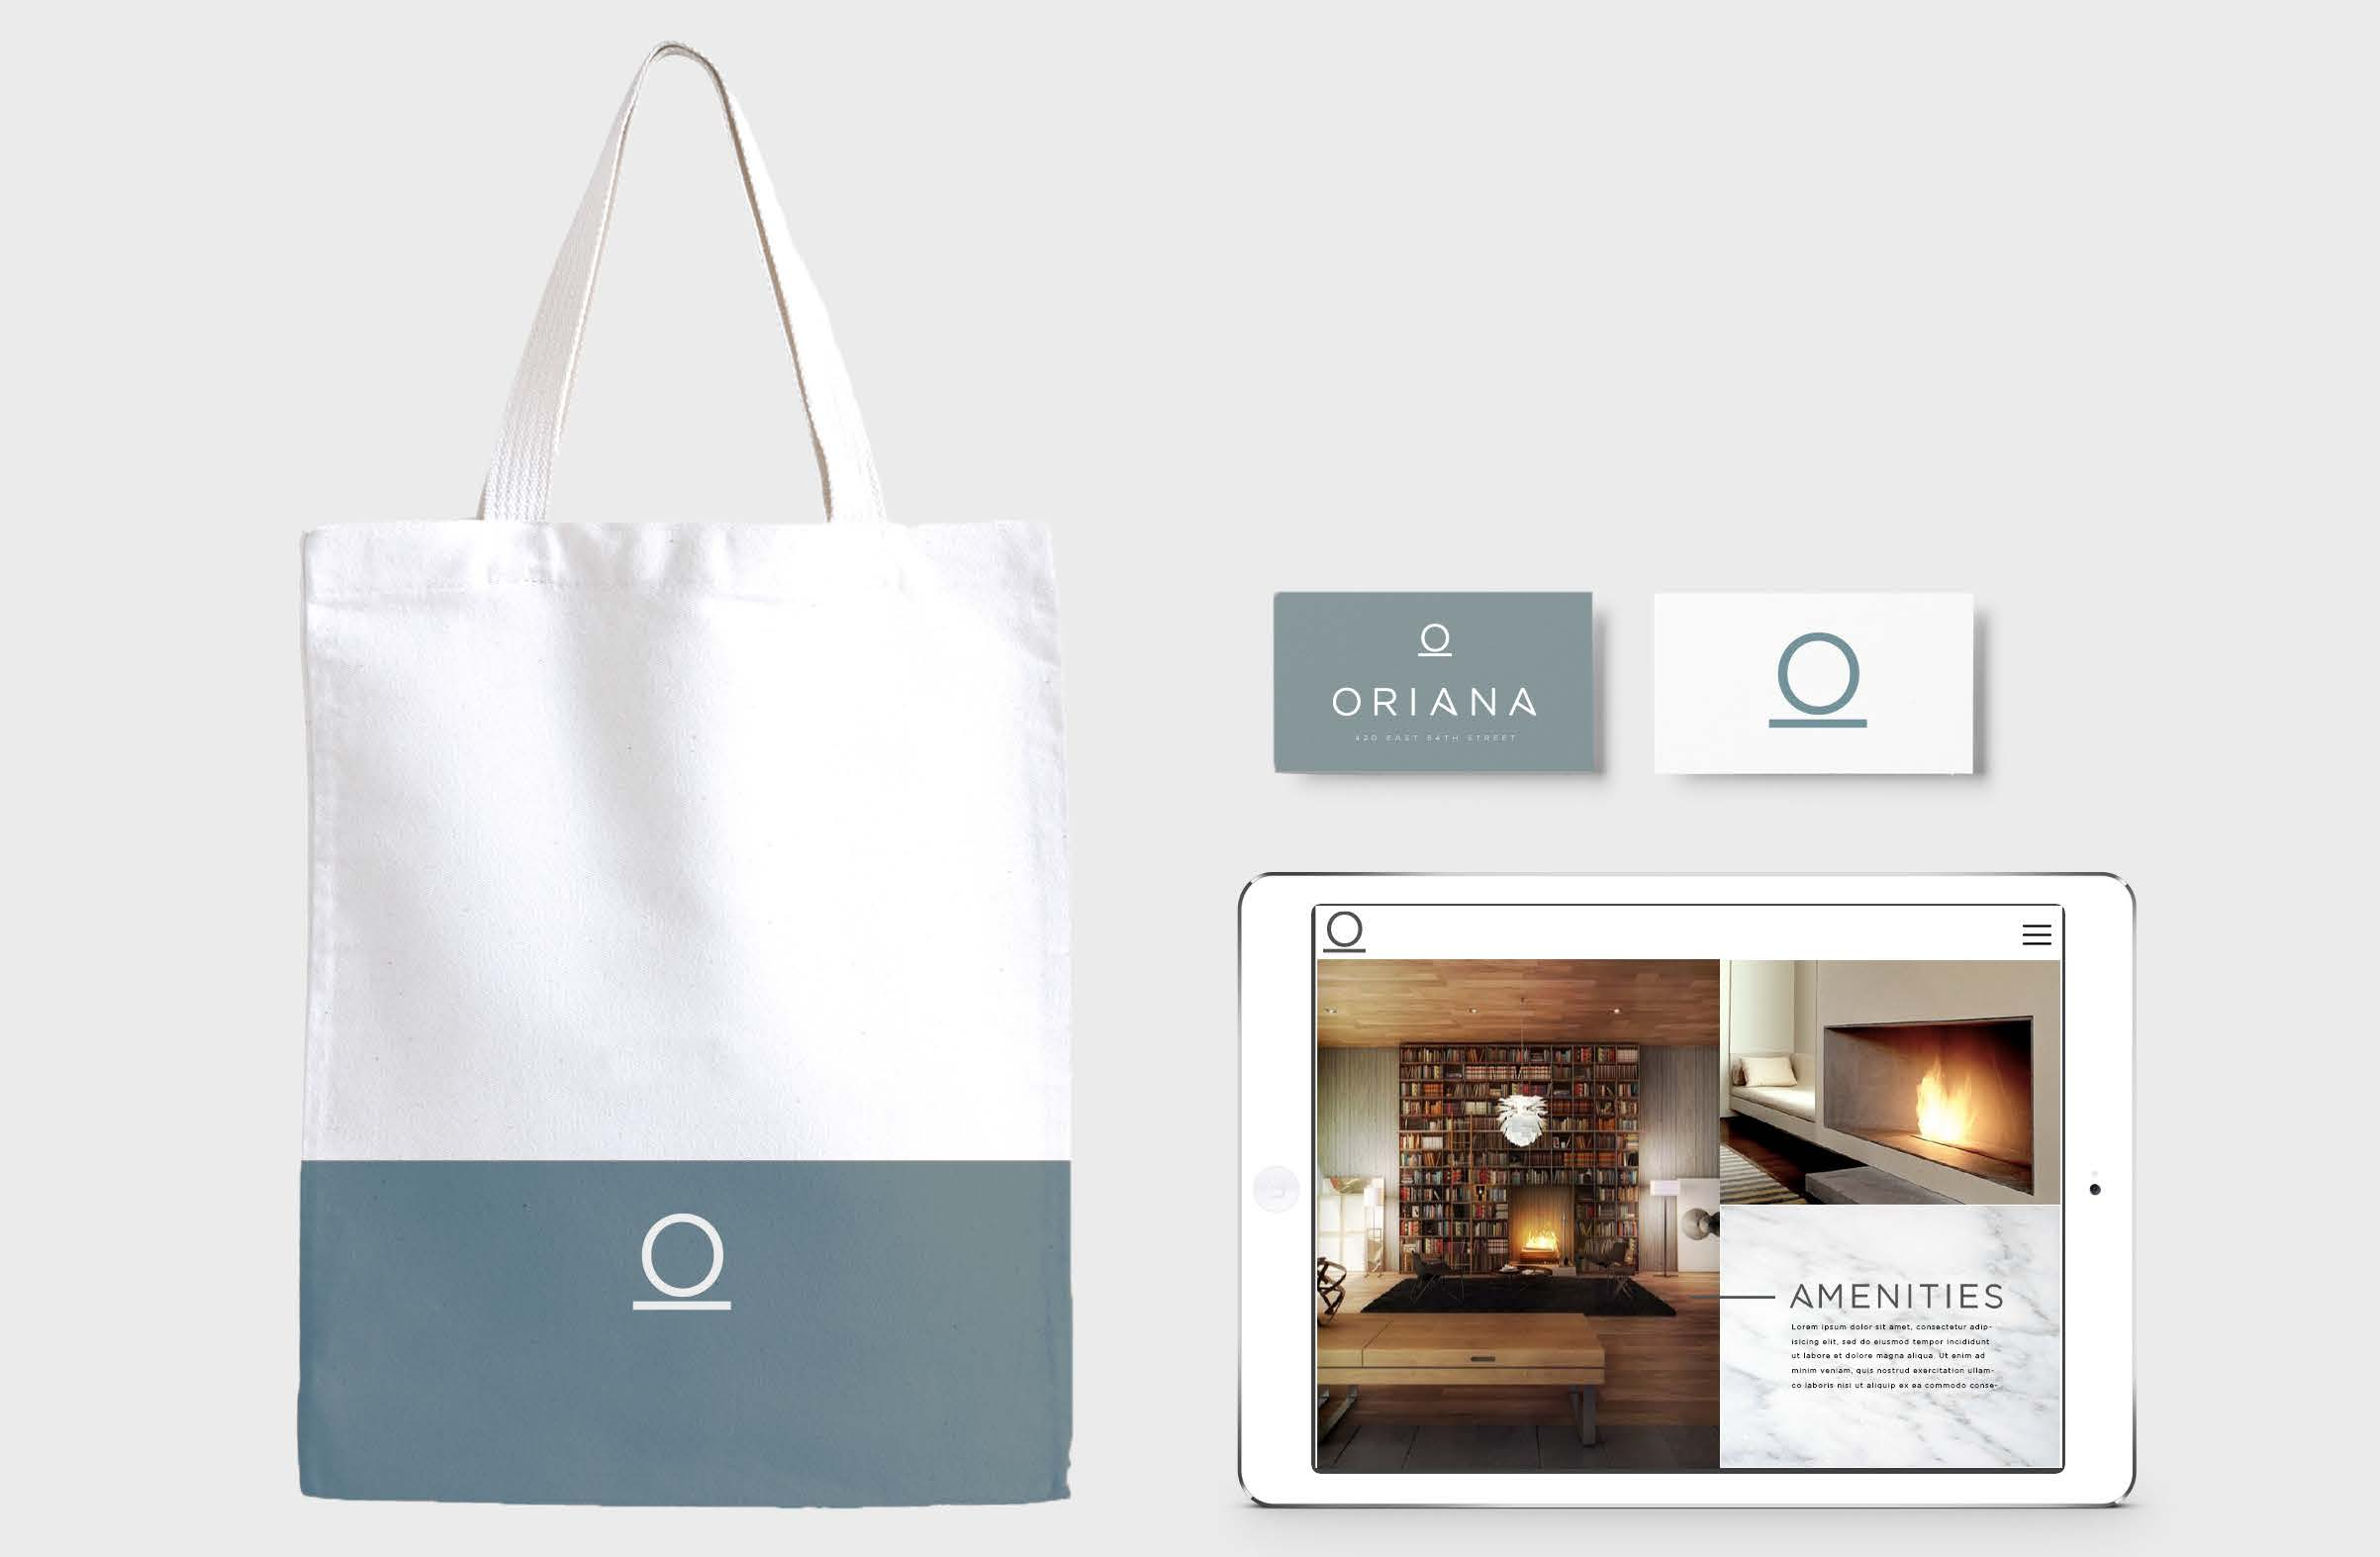 Oriana-Branding Guides_Page_09.jpg